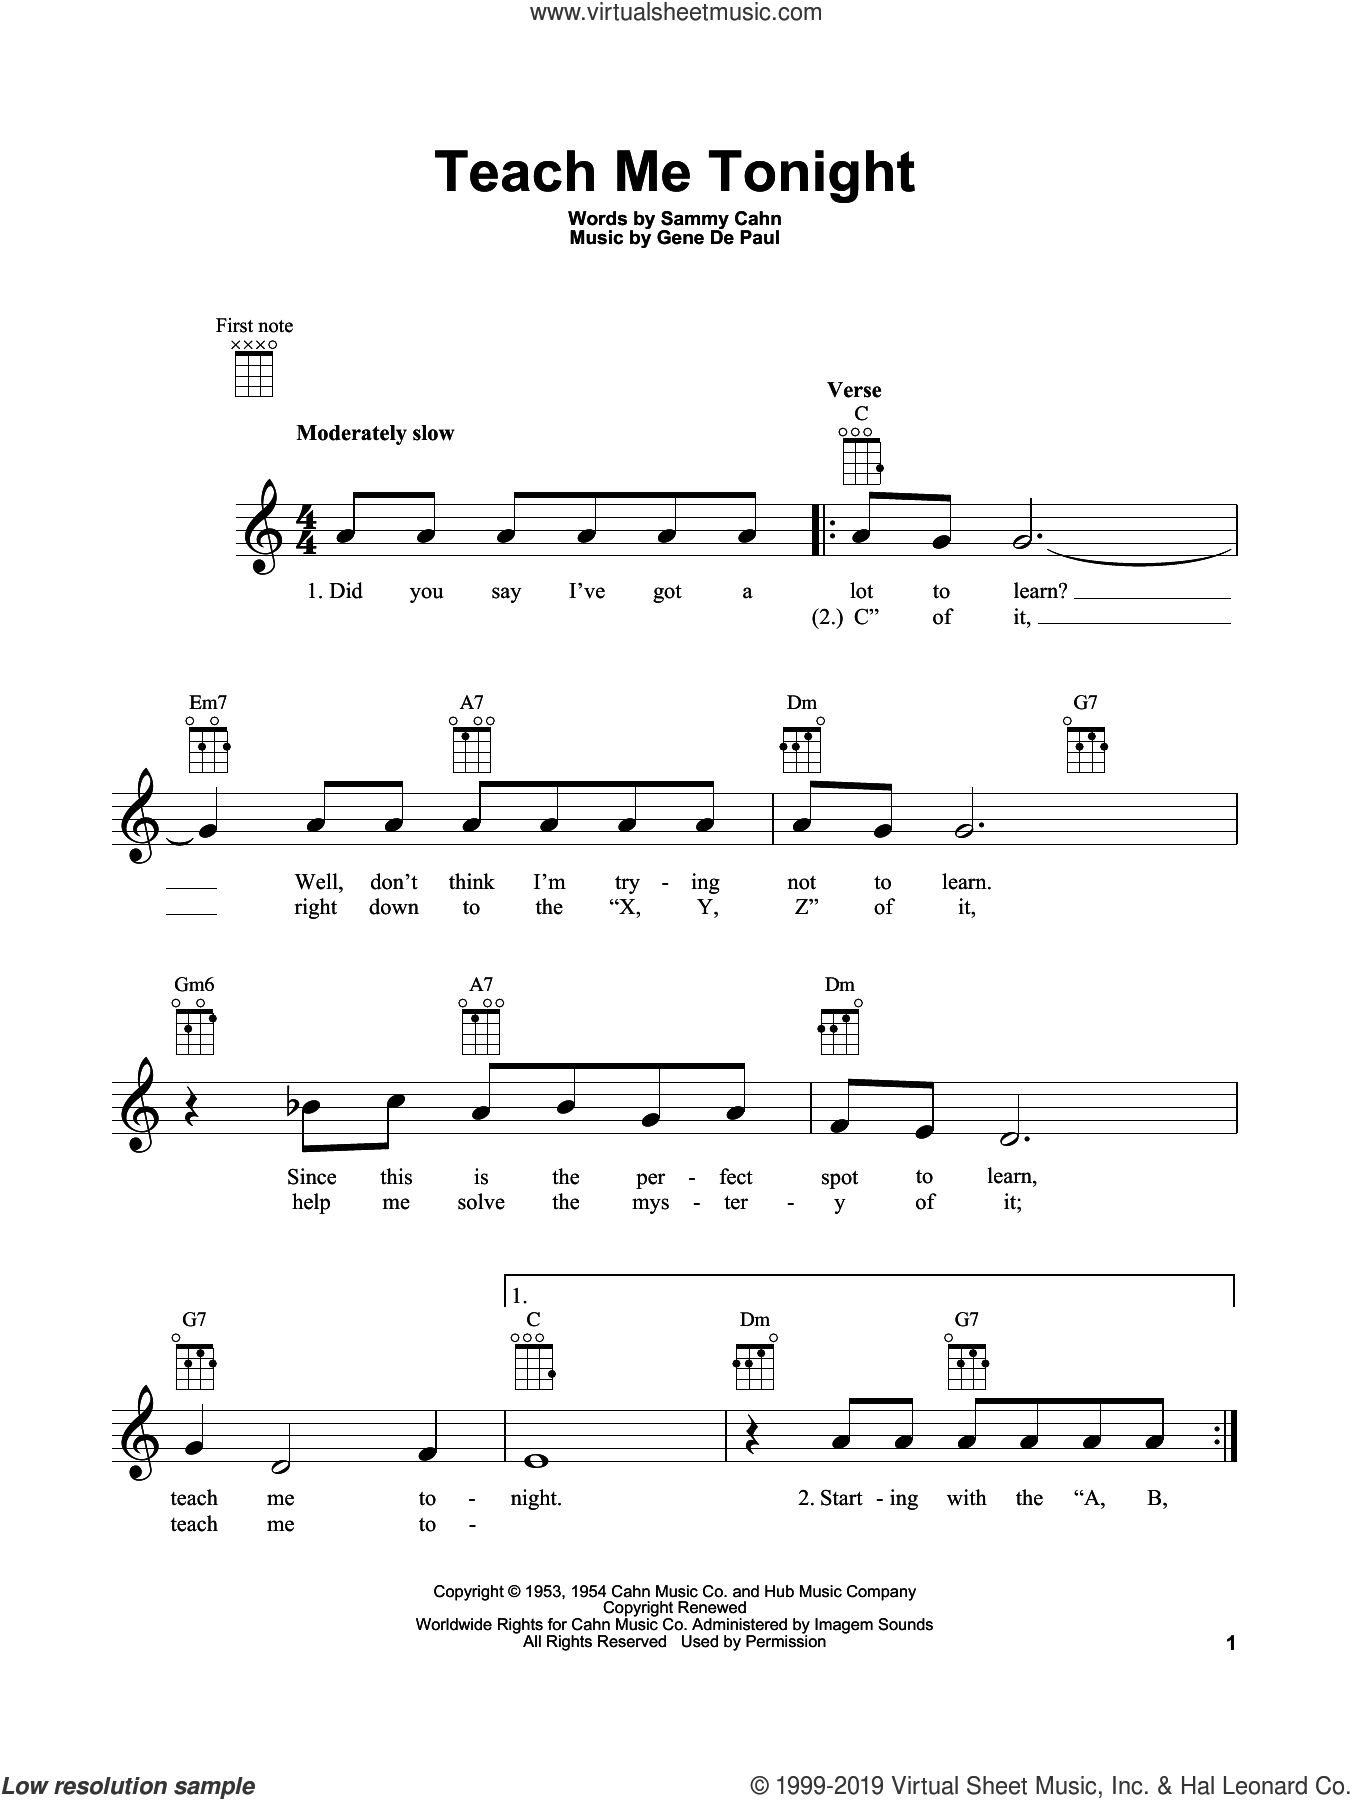 Teach Me Tonight sheet music for ukulele by Sammy Cahn and Gene DePaul, intermediate skill level